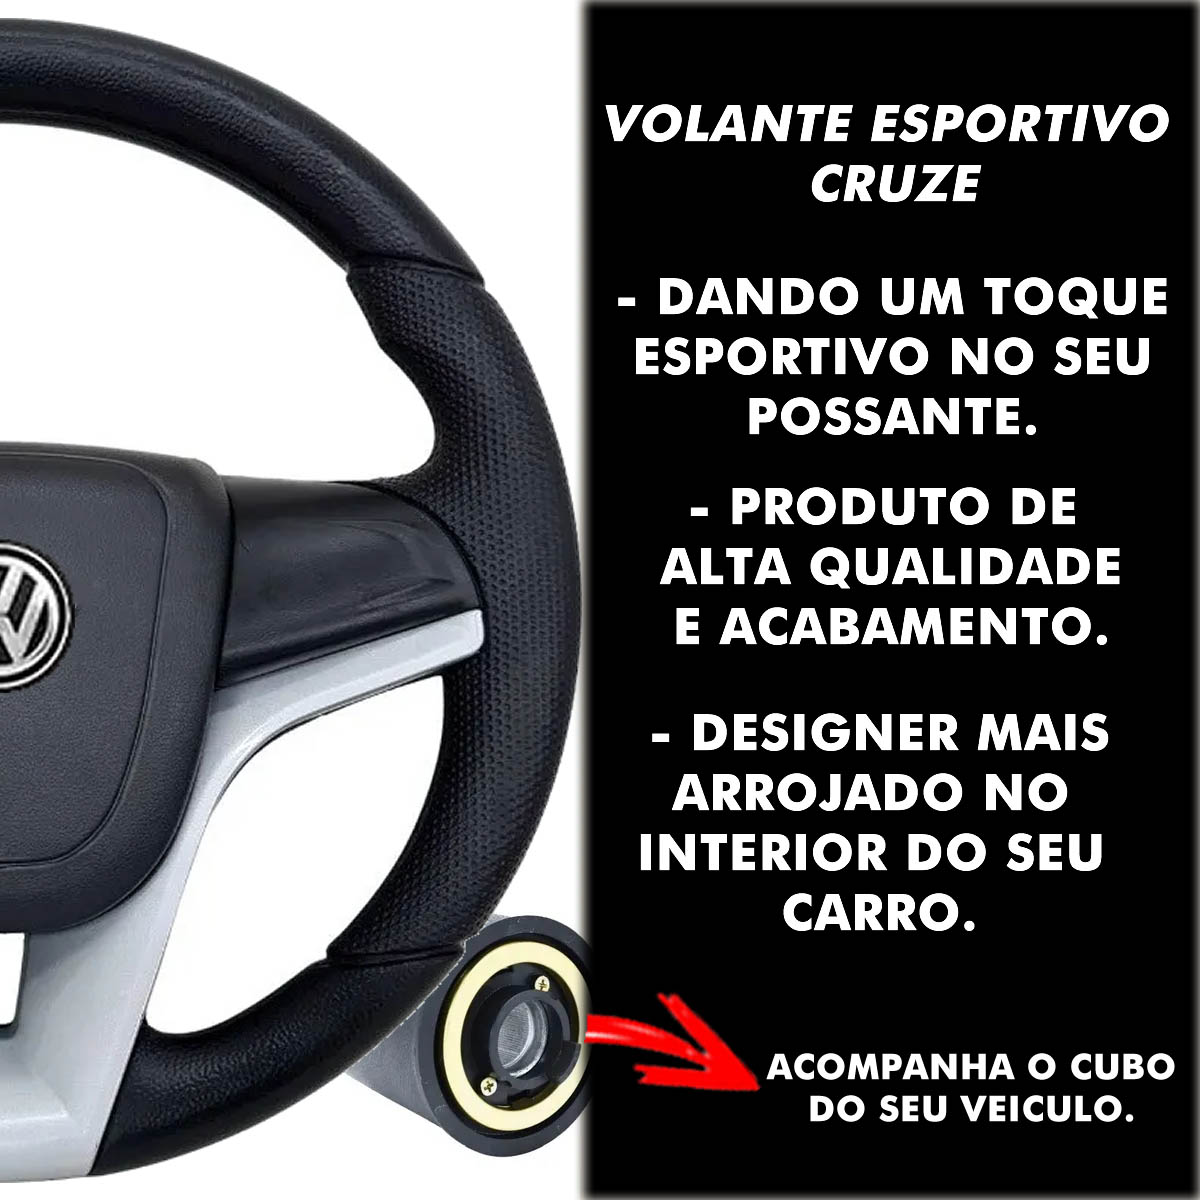 Volante Chevrolet Cruze Esportivo Cubo Atacado Poliparts